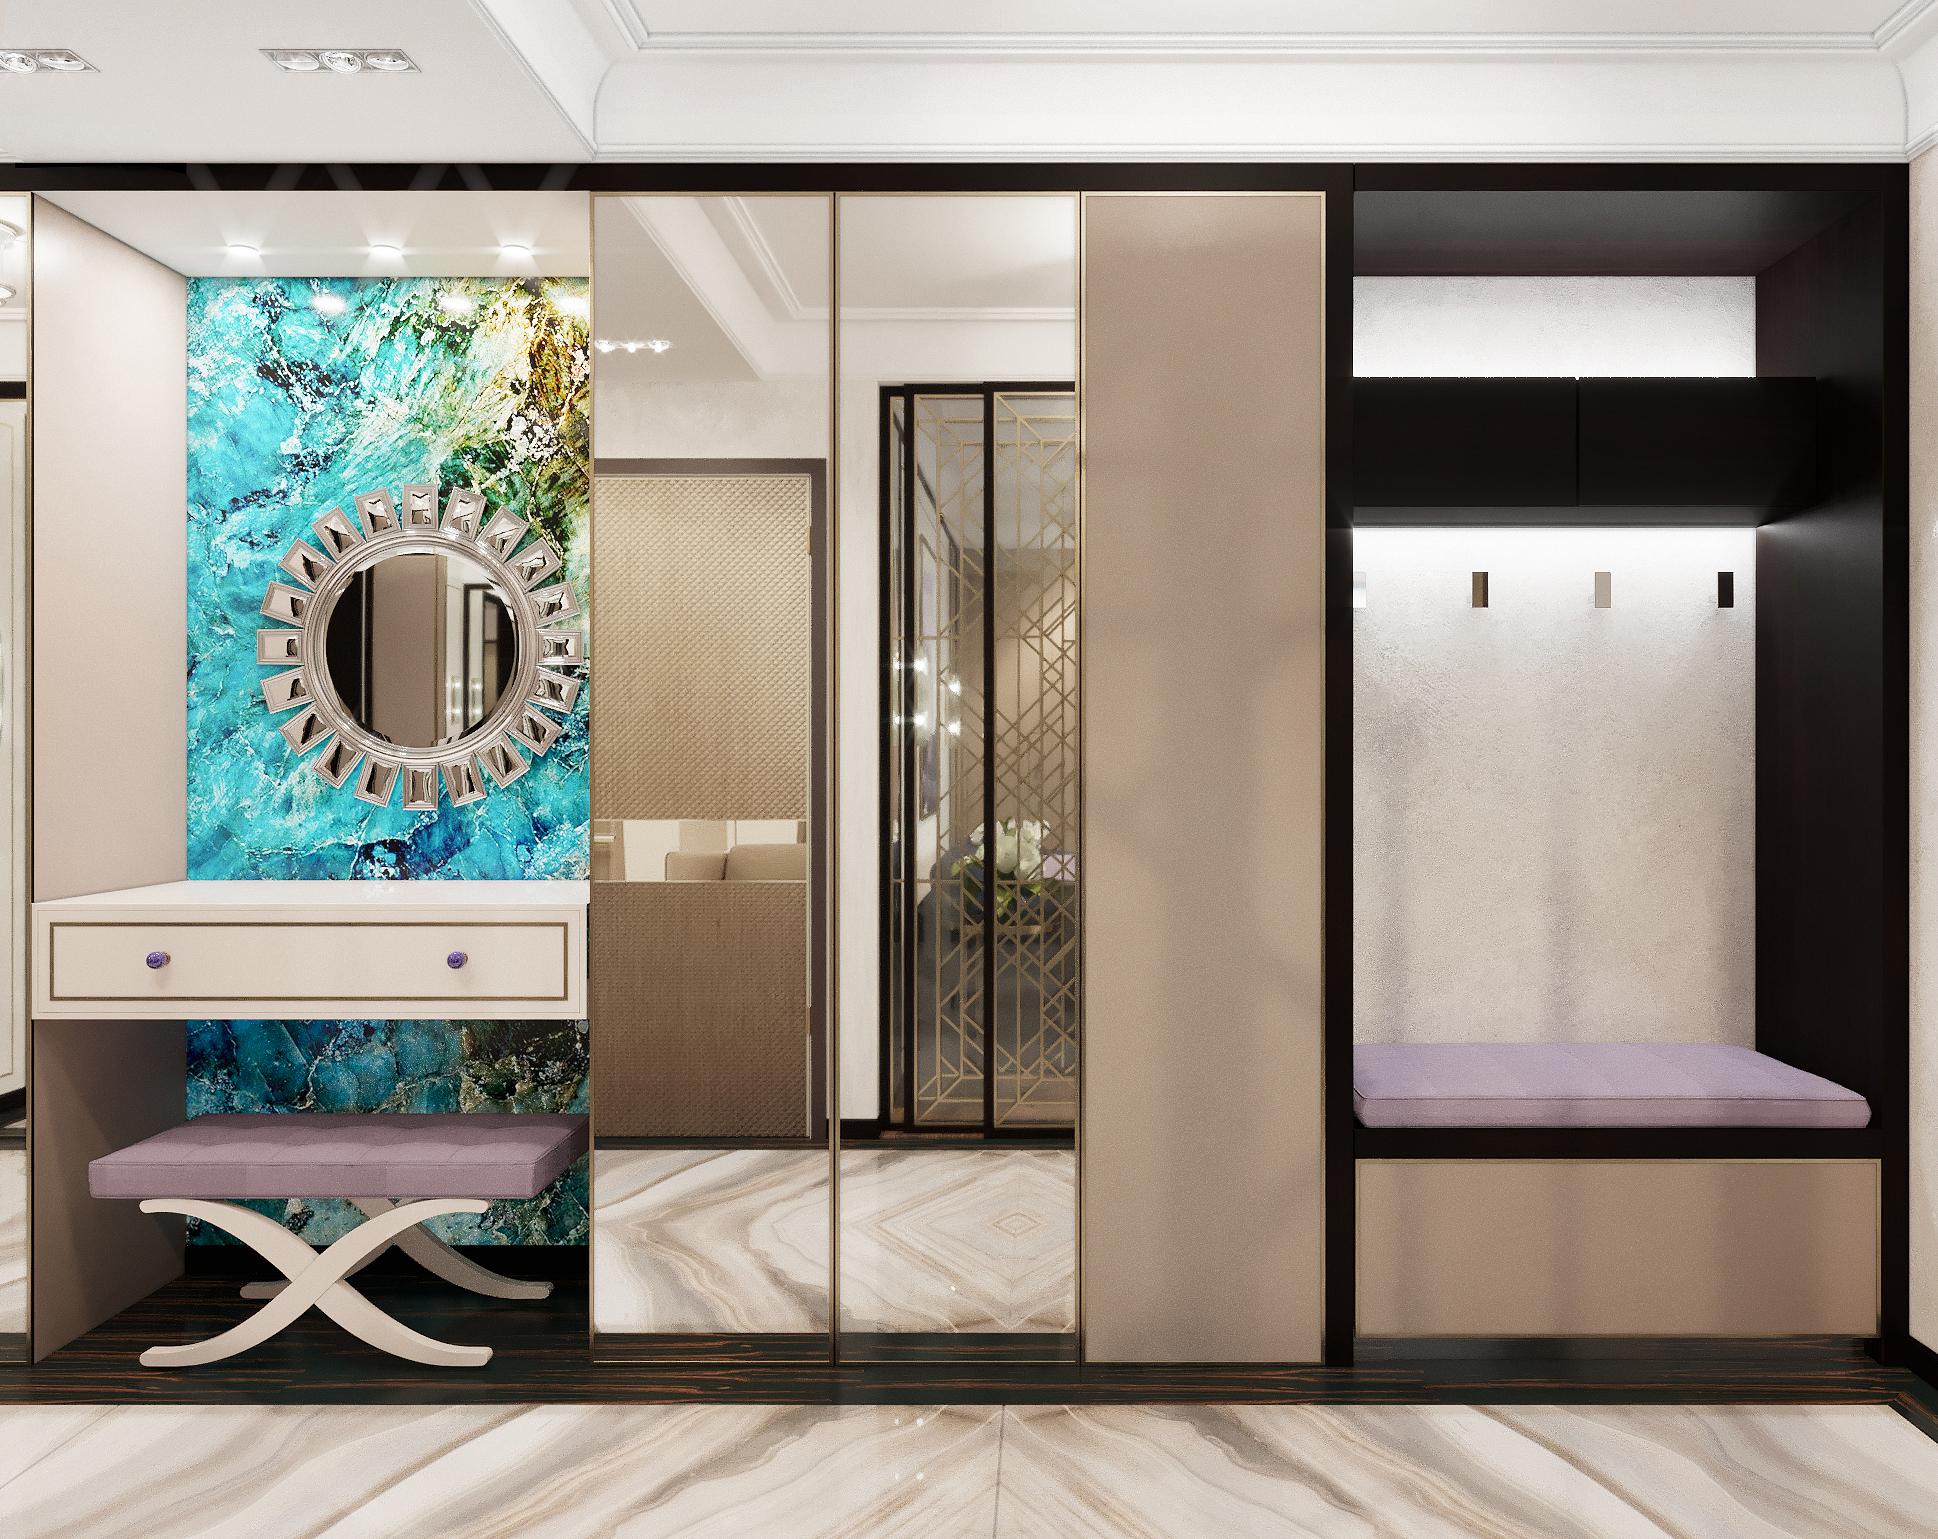 жк на сосинской - ДИЗАЙН интерьер квартиры в стиле модерн ар-деко.